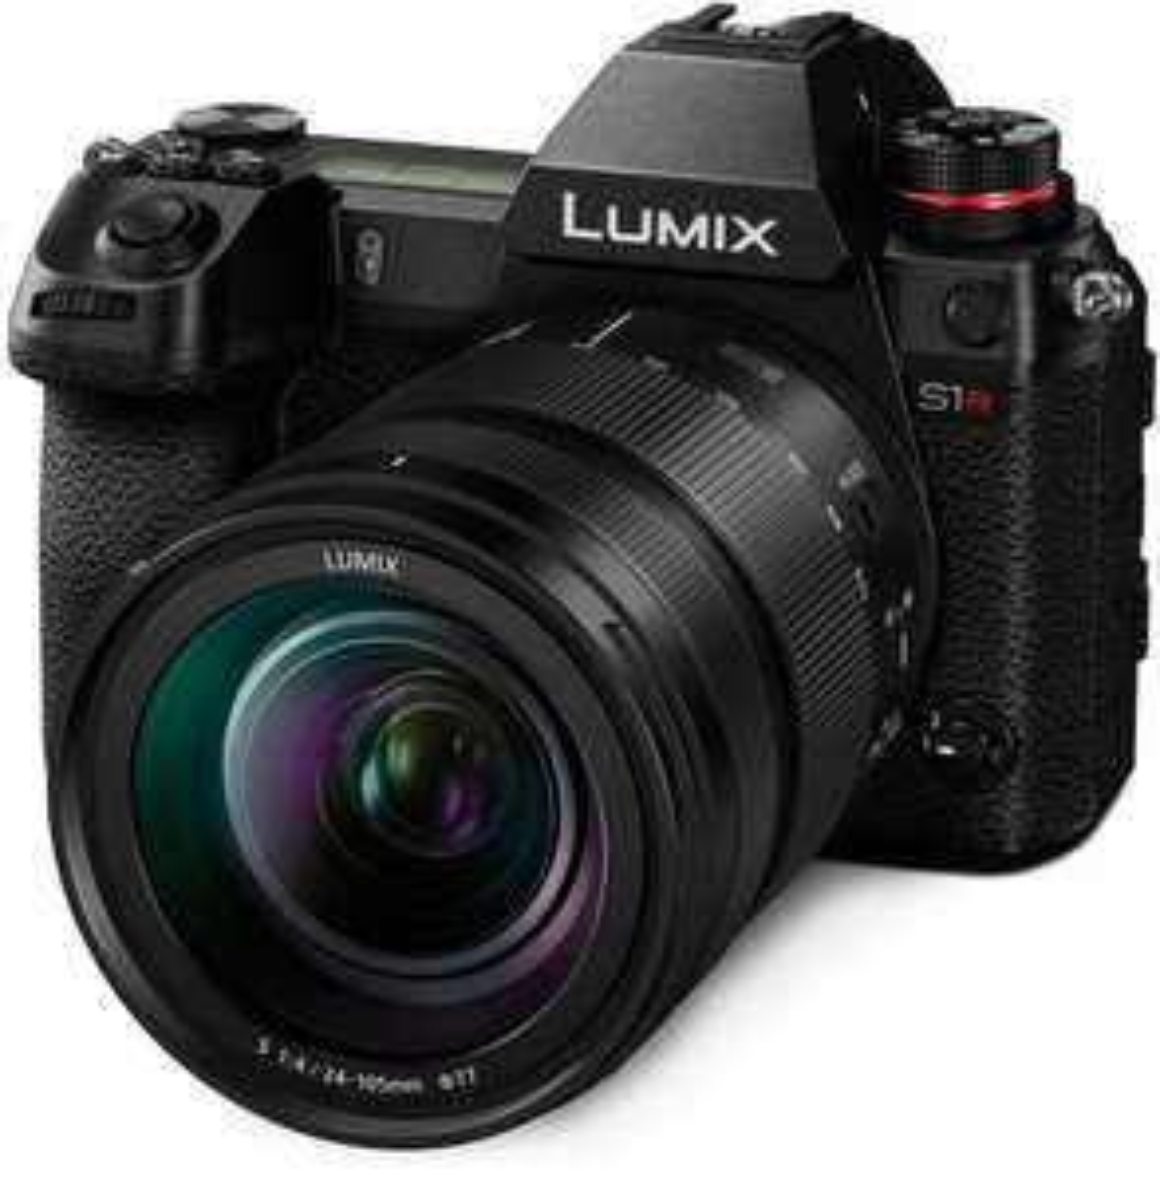 Panasonic Lumix DC-S1R Systemkamera inkl. 24-105F4 Objektiv | Miss Numerique FR